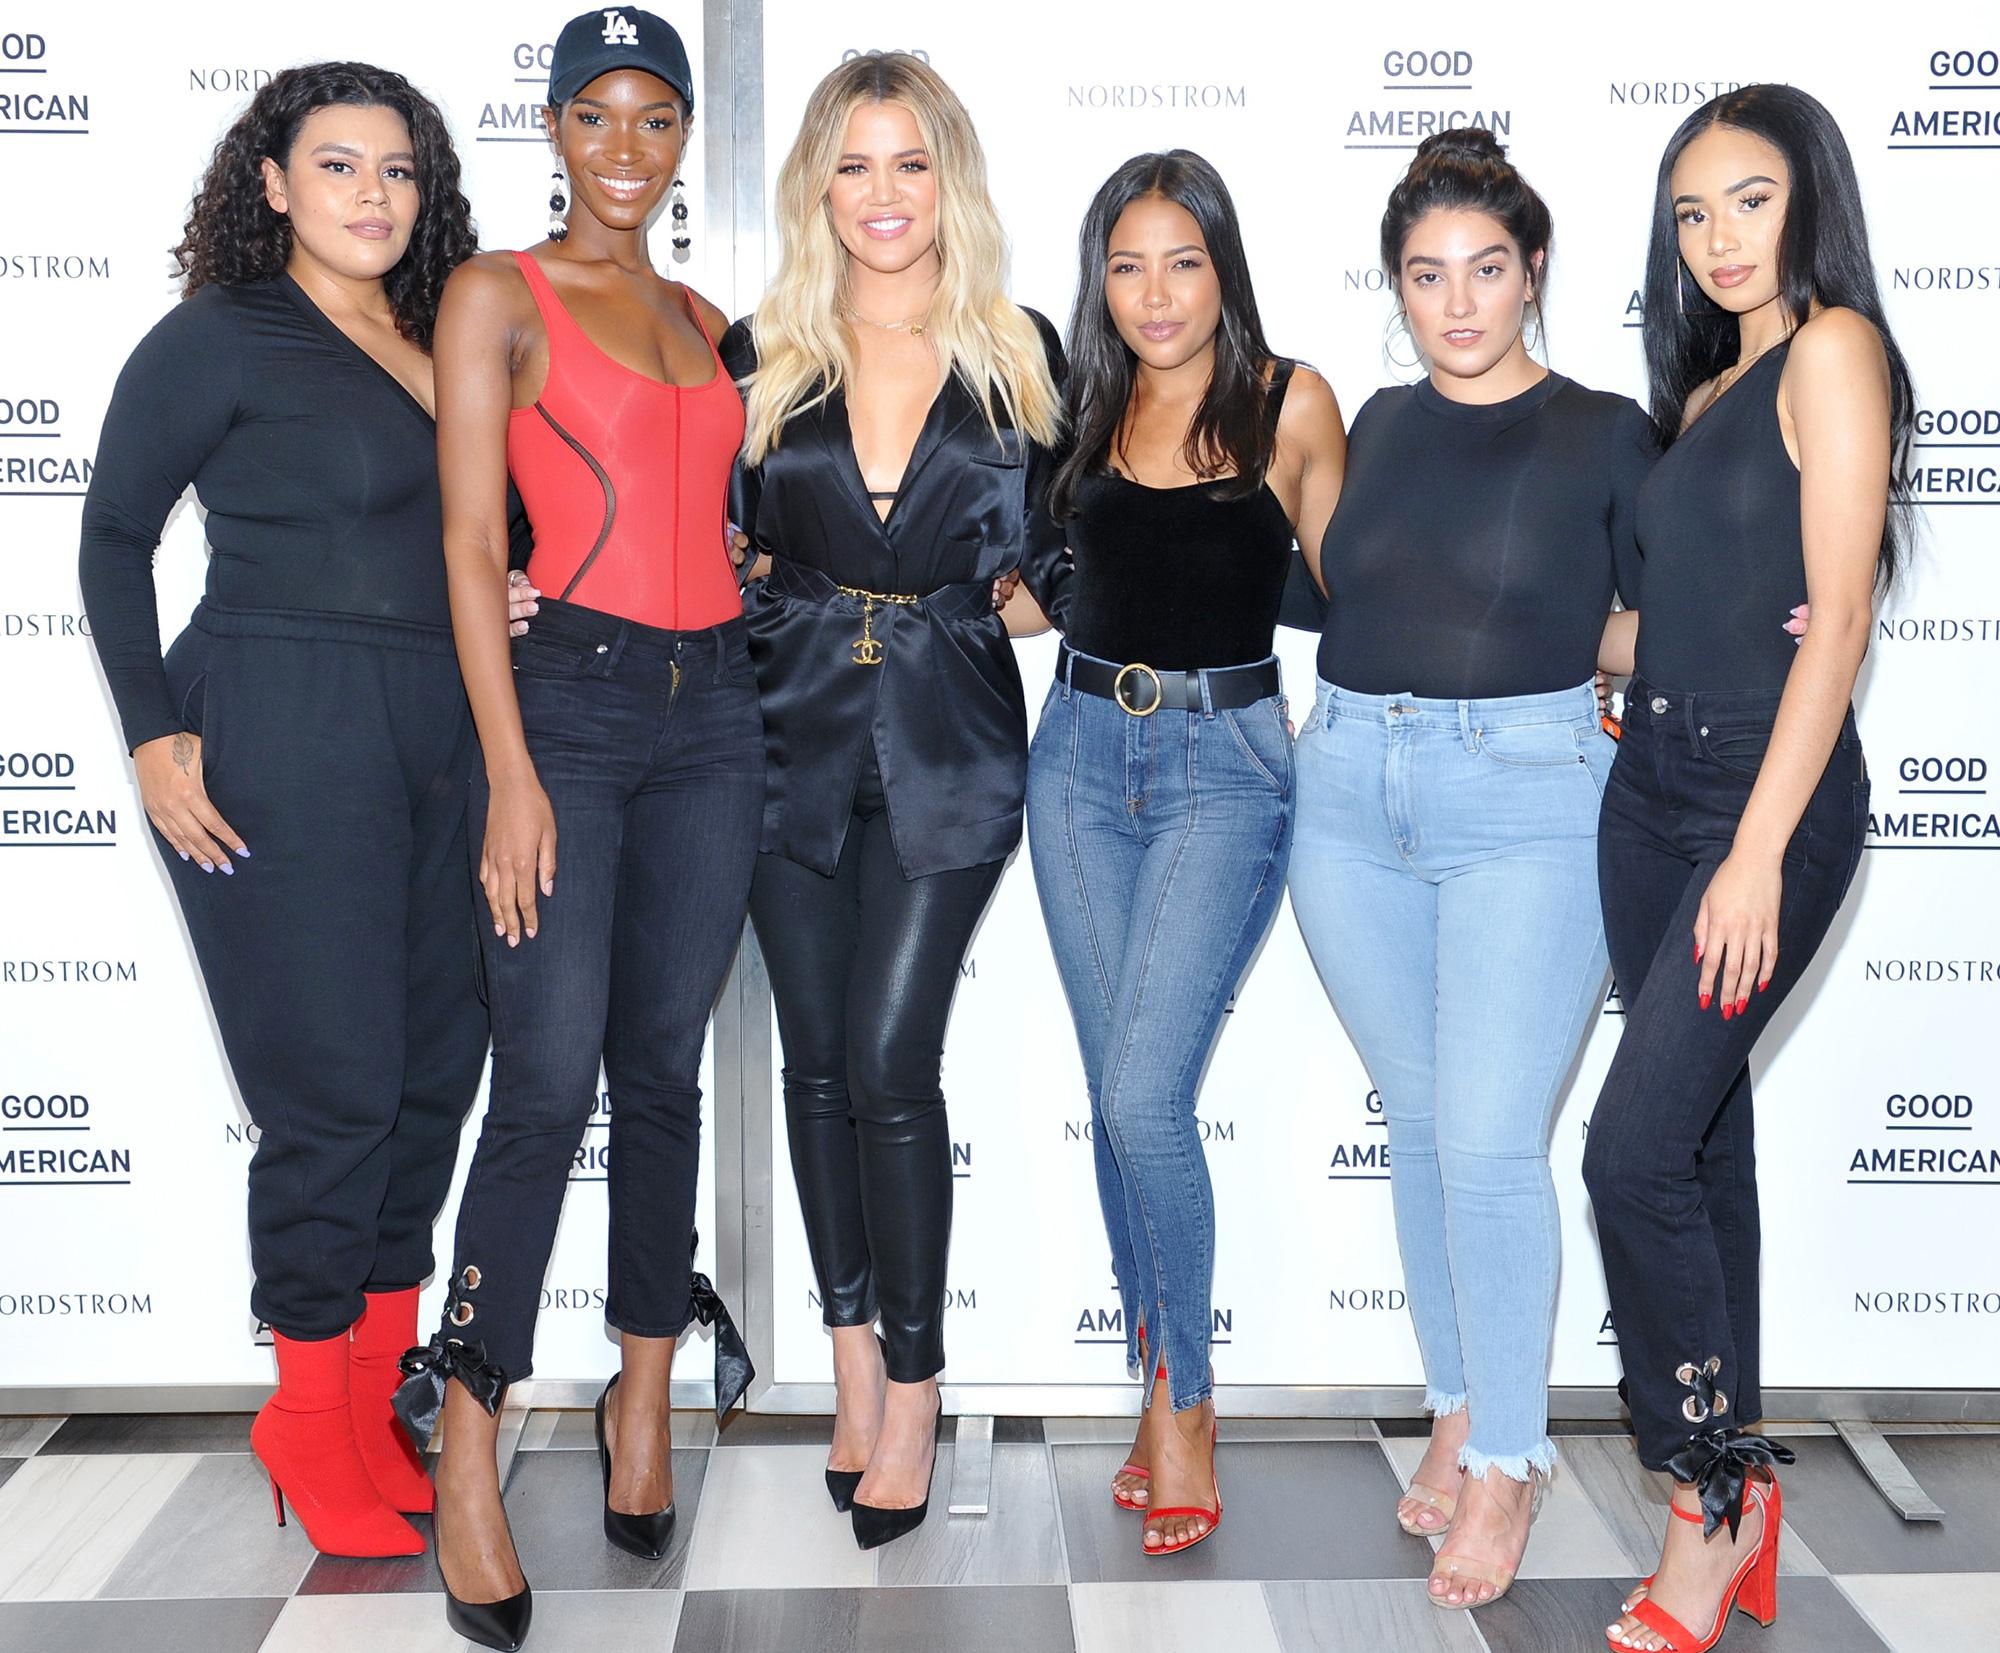 Roxy Reyes, Shae Scott, Khloe Kardashian, Emma Grede, Nadia Aboulhosn and Symphani Soto, Good American Anniversary Celebration